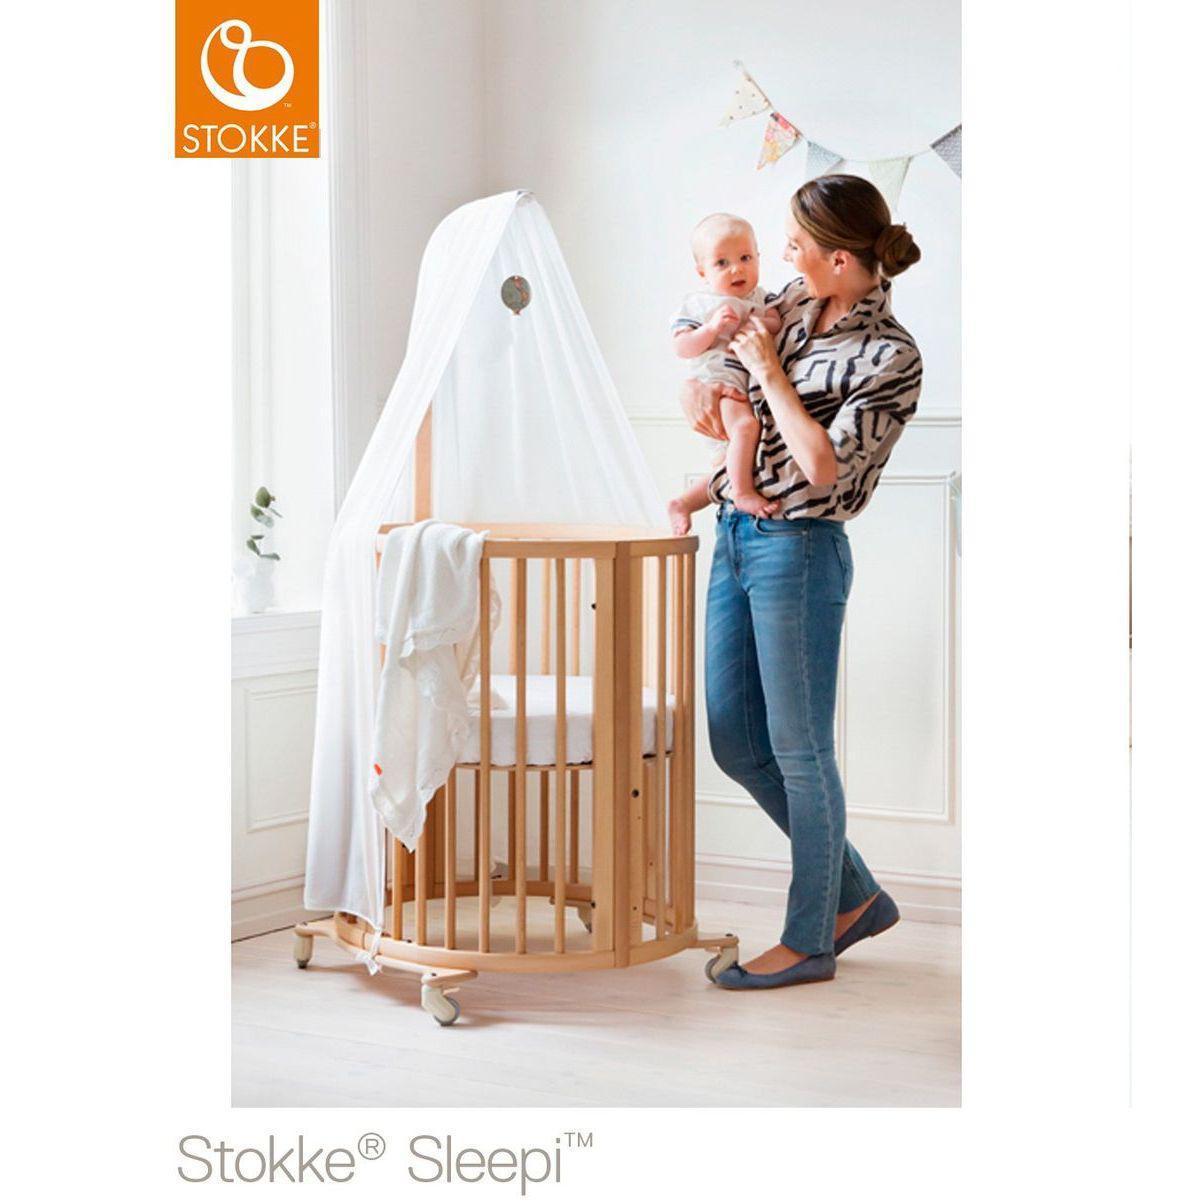 Voile de lit SLEEPI Stokke blanc